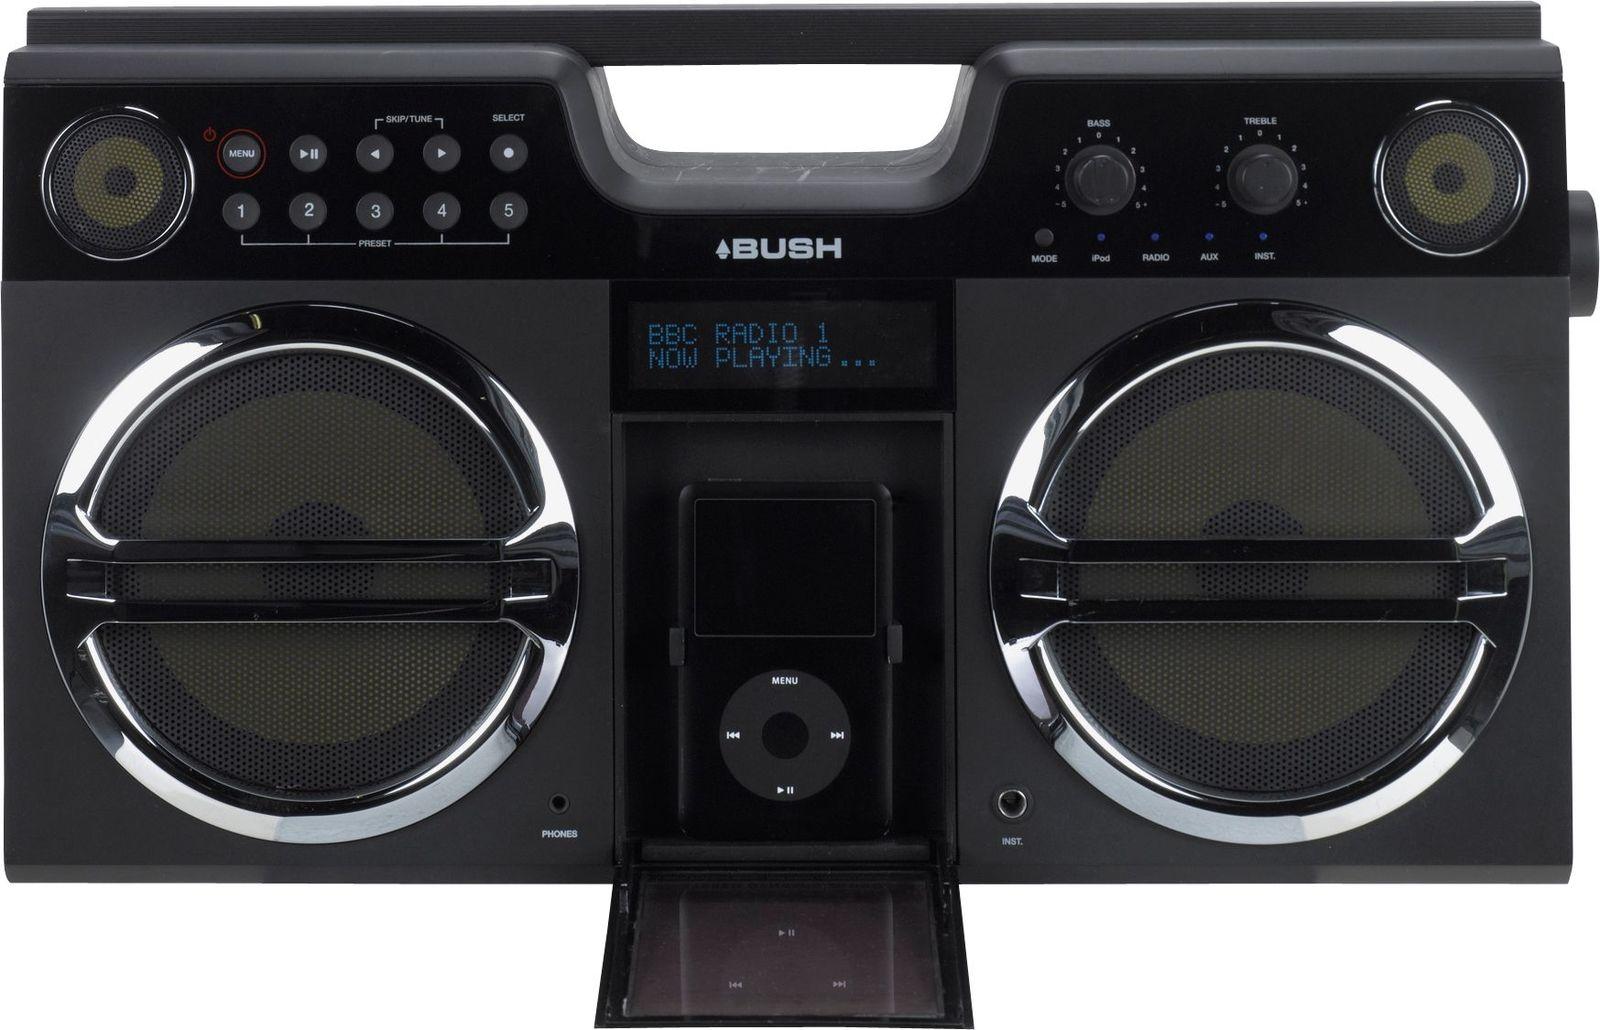 Bush Boombox With iPod Docking Station  £22.45  Argos eBay Store